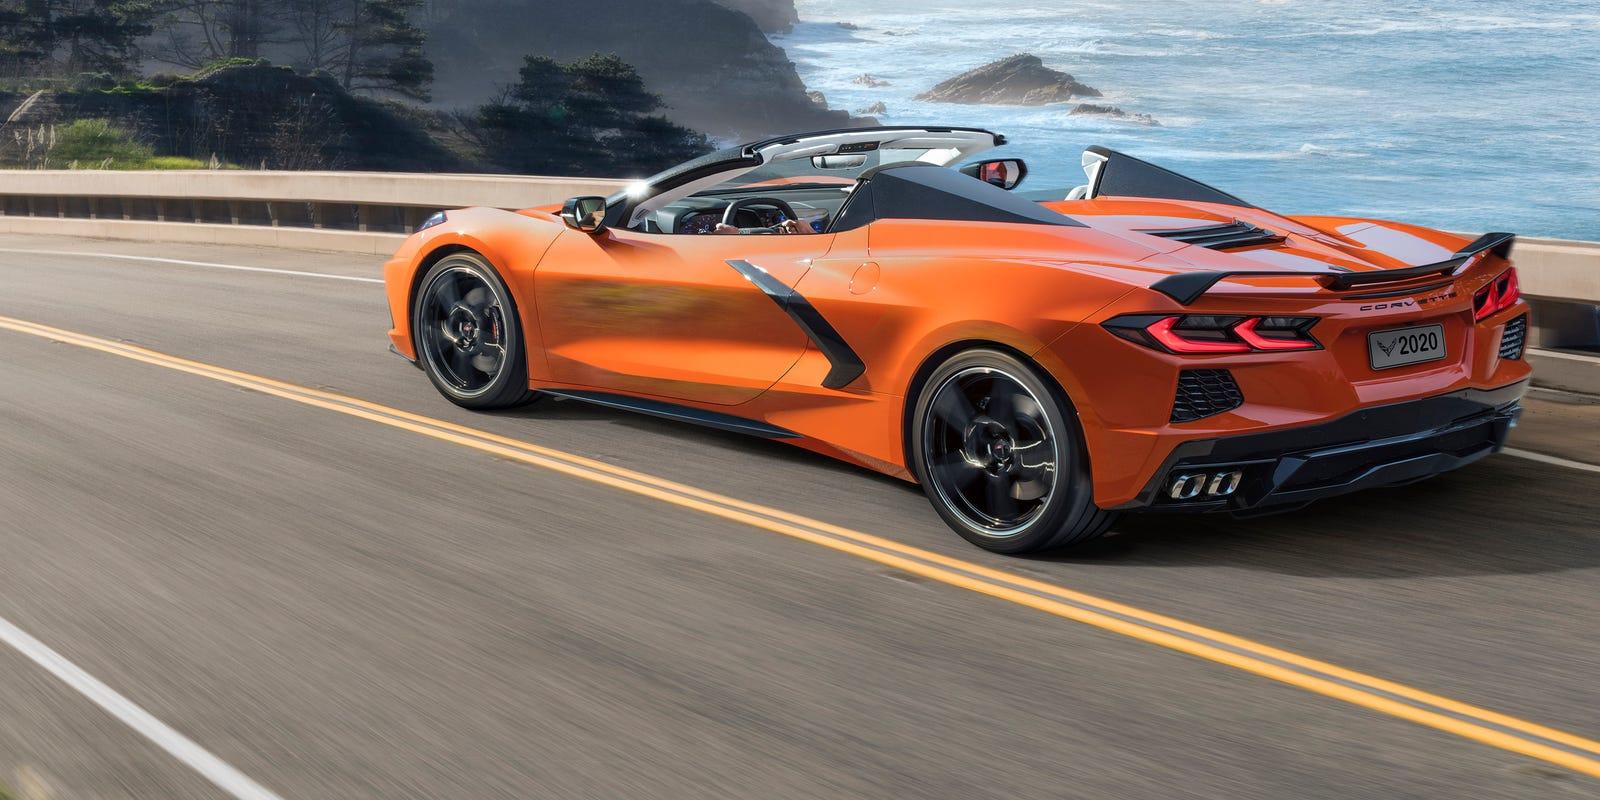 New Corvette Stingray >> 2020 Corvette Stingray Convertible Gm Reveals First Vette